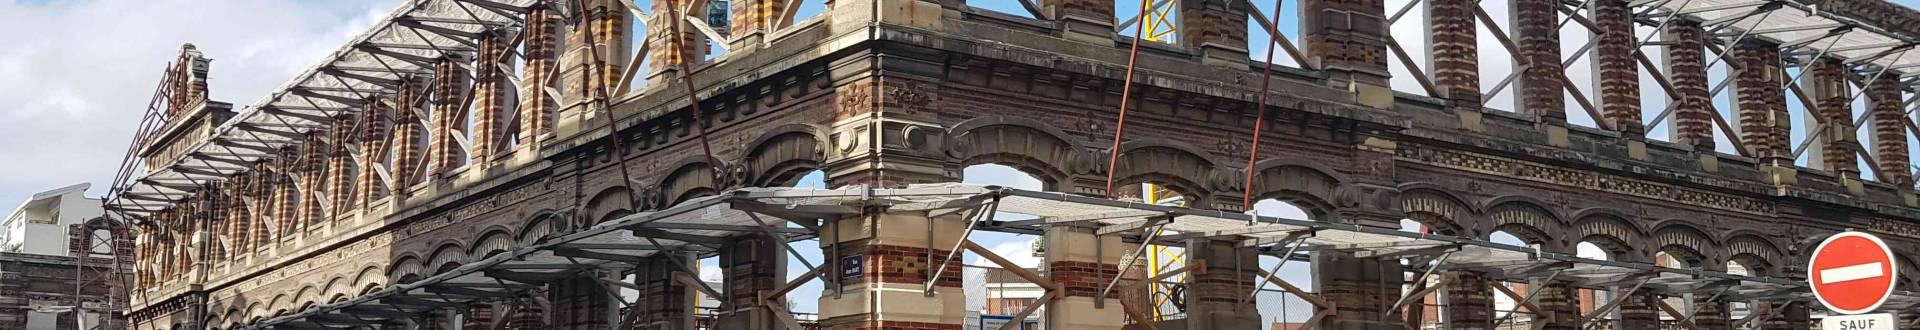 CEREMAKlapty | Lyon France | 360 3D VR tours